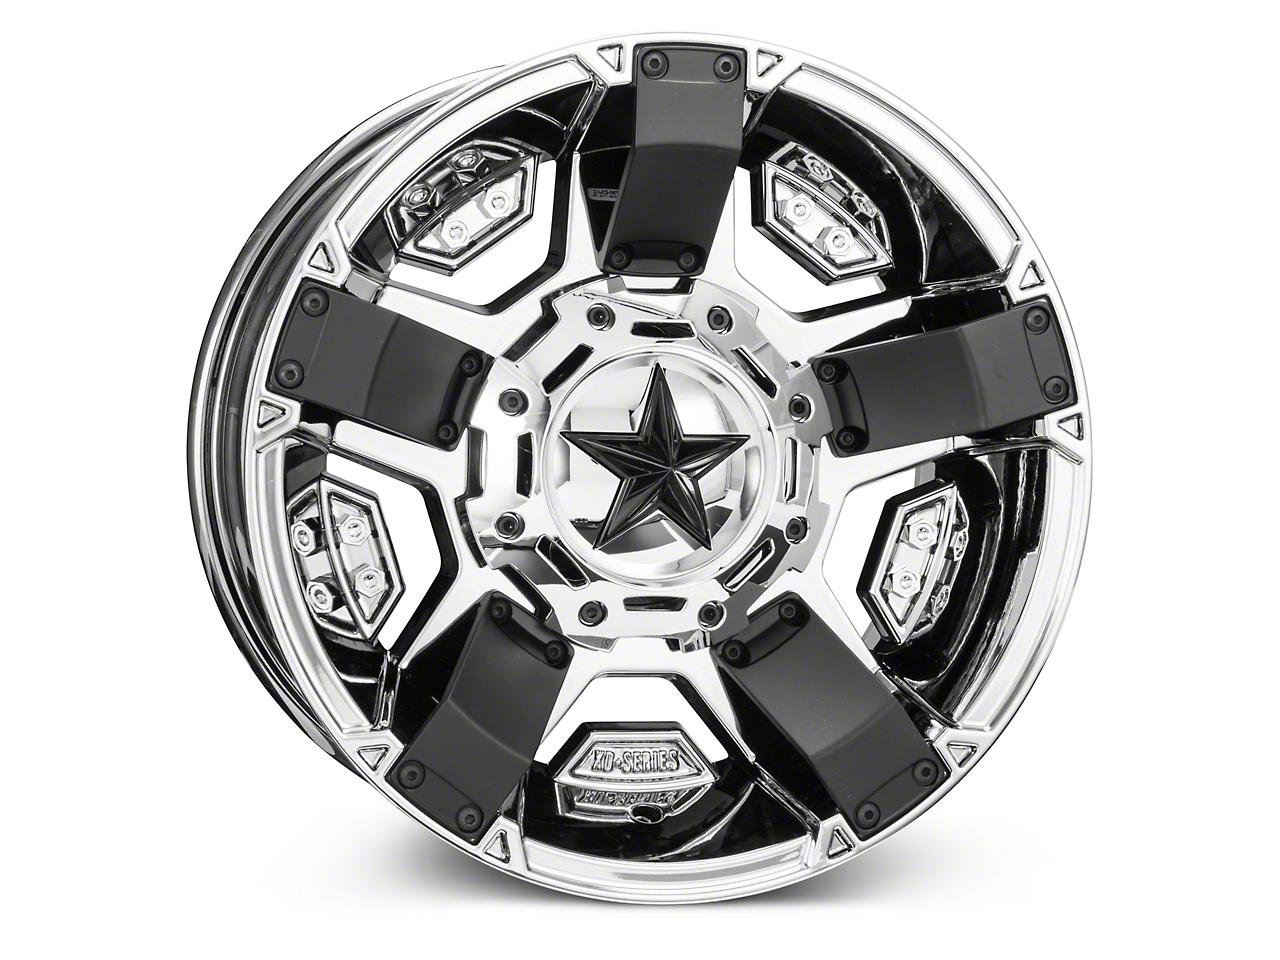 Rockstar XD811 RS2 PVD Chrome Wheels (07-18 Wrangler JK; 2018 Wrangler JL)